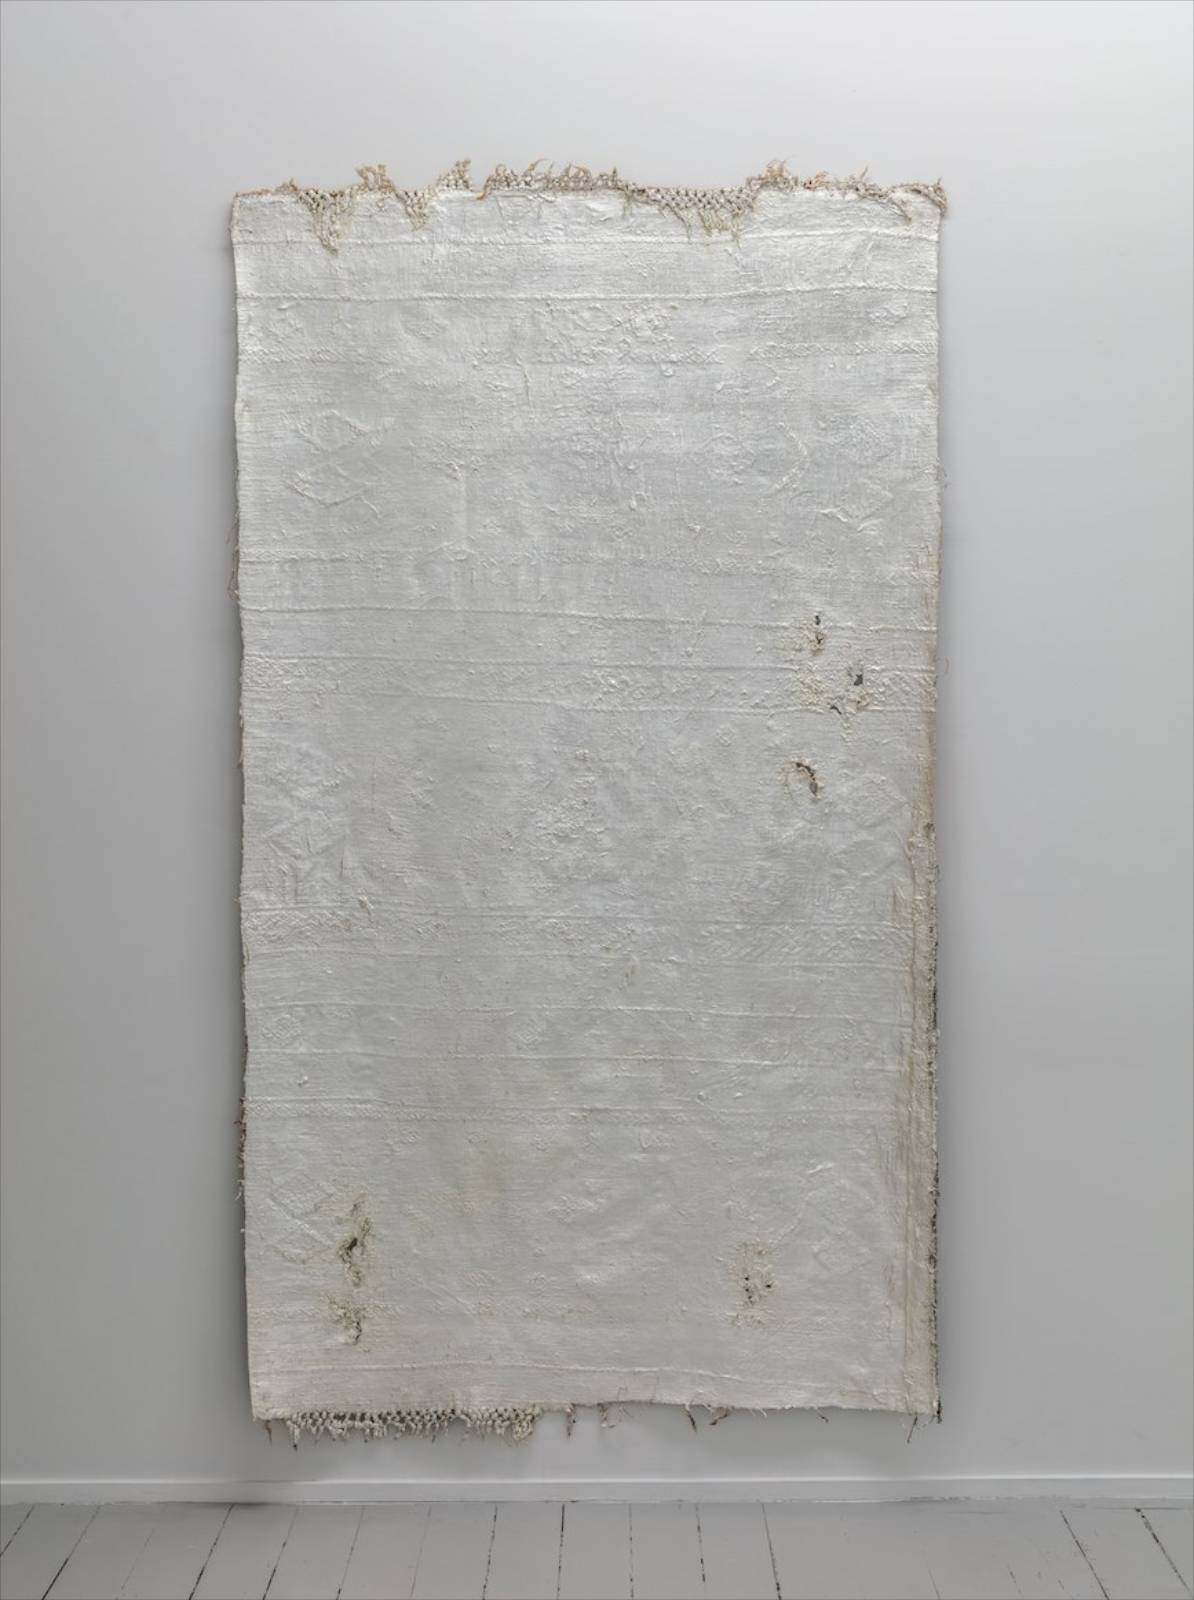 Al-mulk, 2017, anatolian rug, rubber, silverleaf, lacquer, 220 x 119 cm